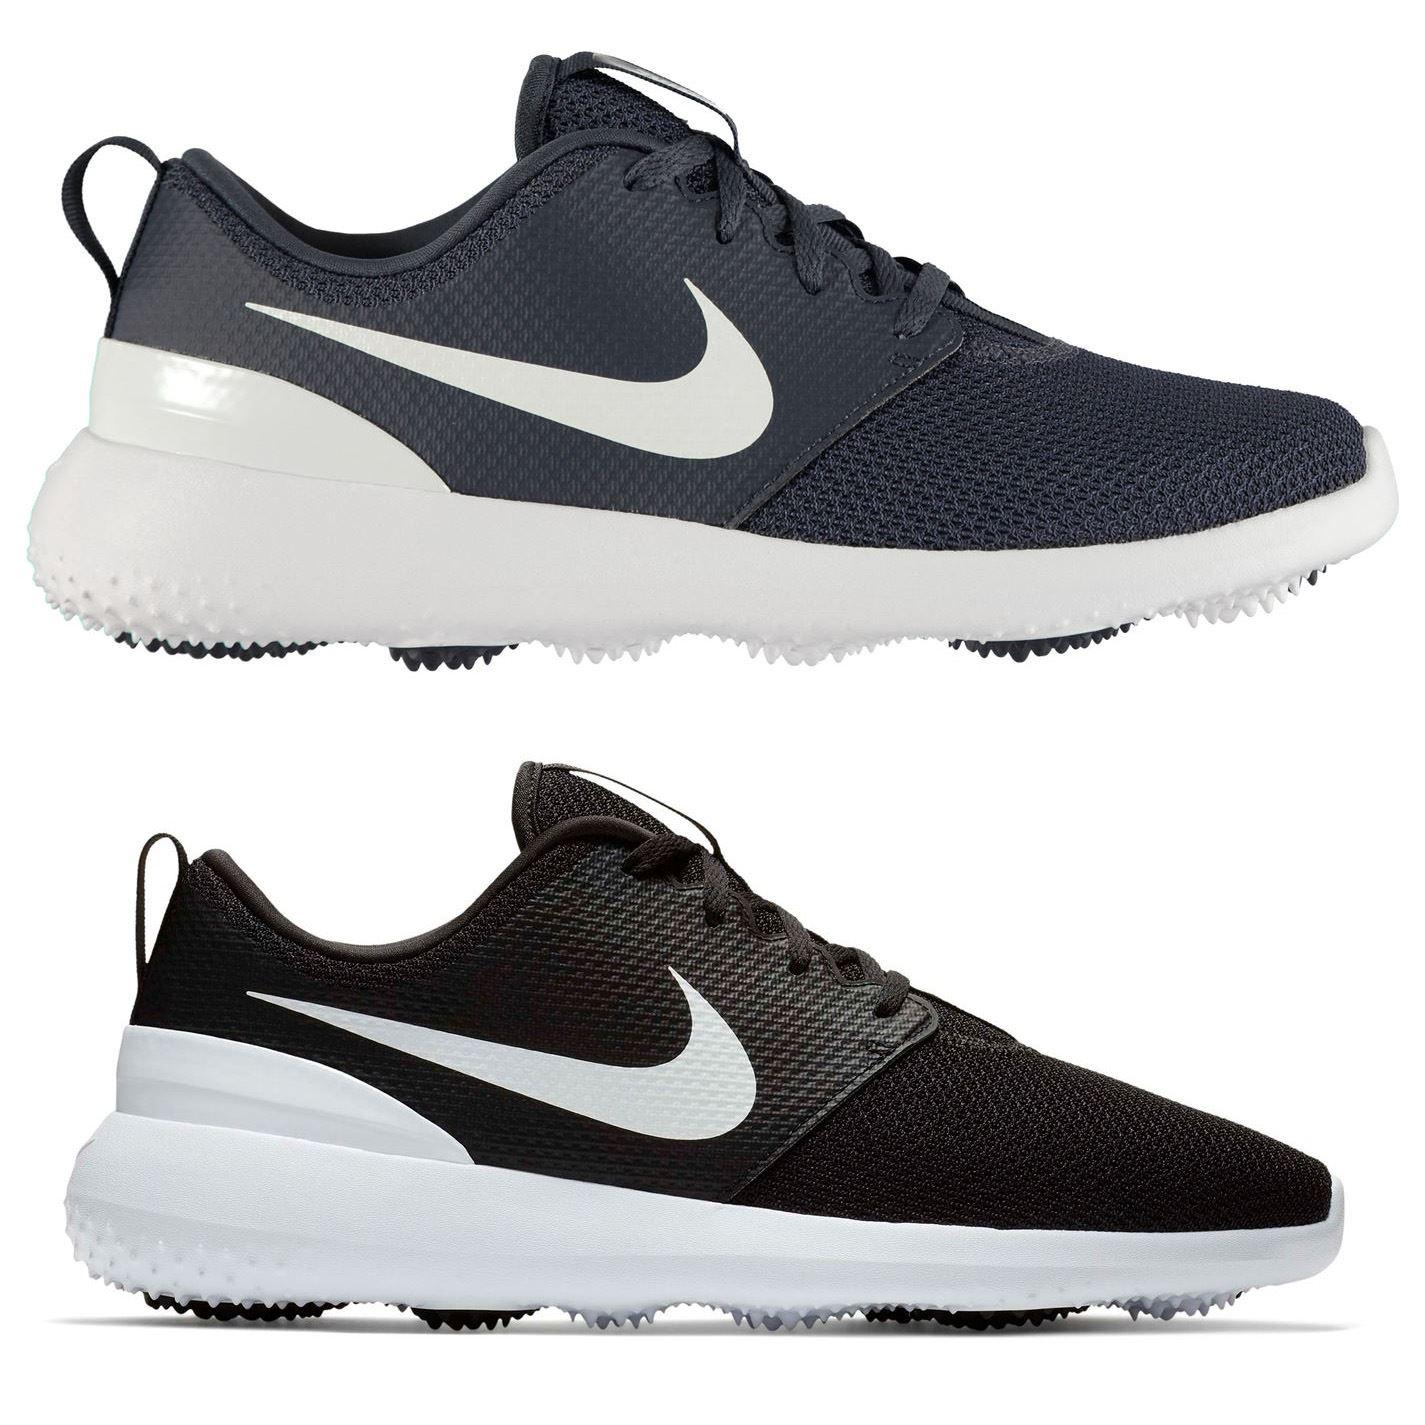 san francisco 3bdf2 d0e02 ... Nike Roshe Golf Shoes Mens Spikeless Footwear ...